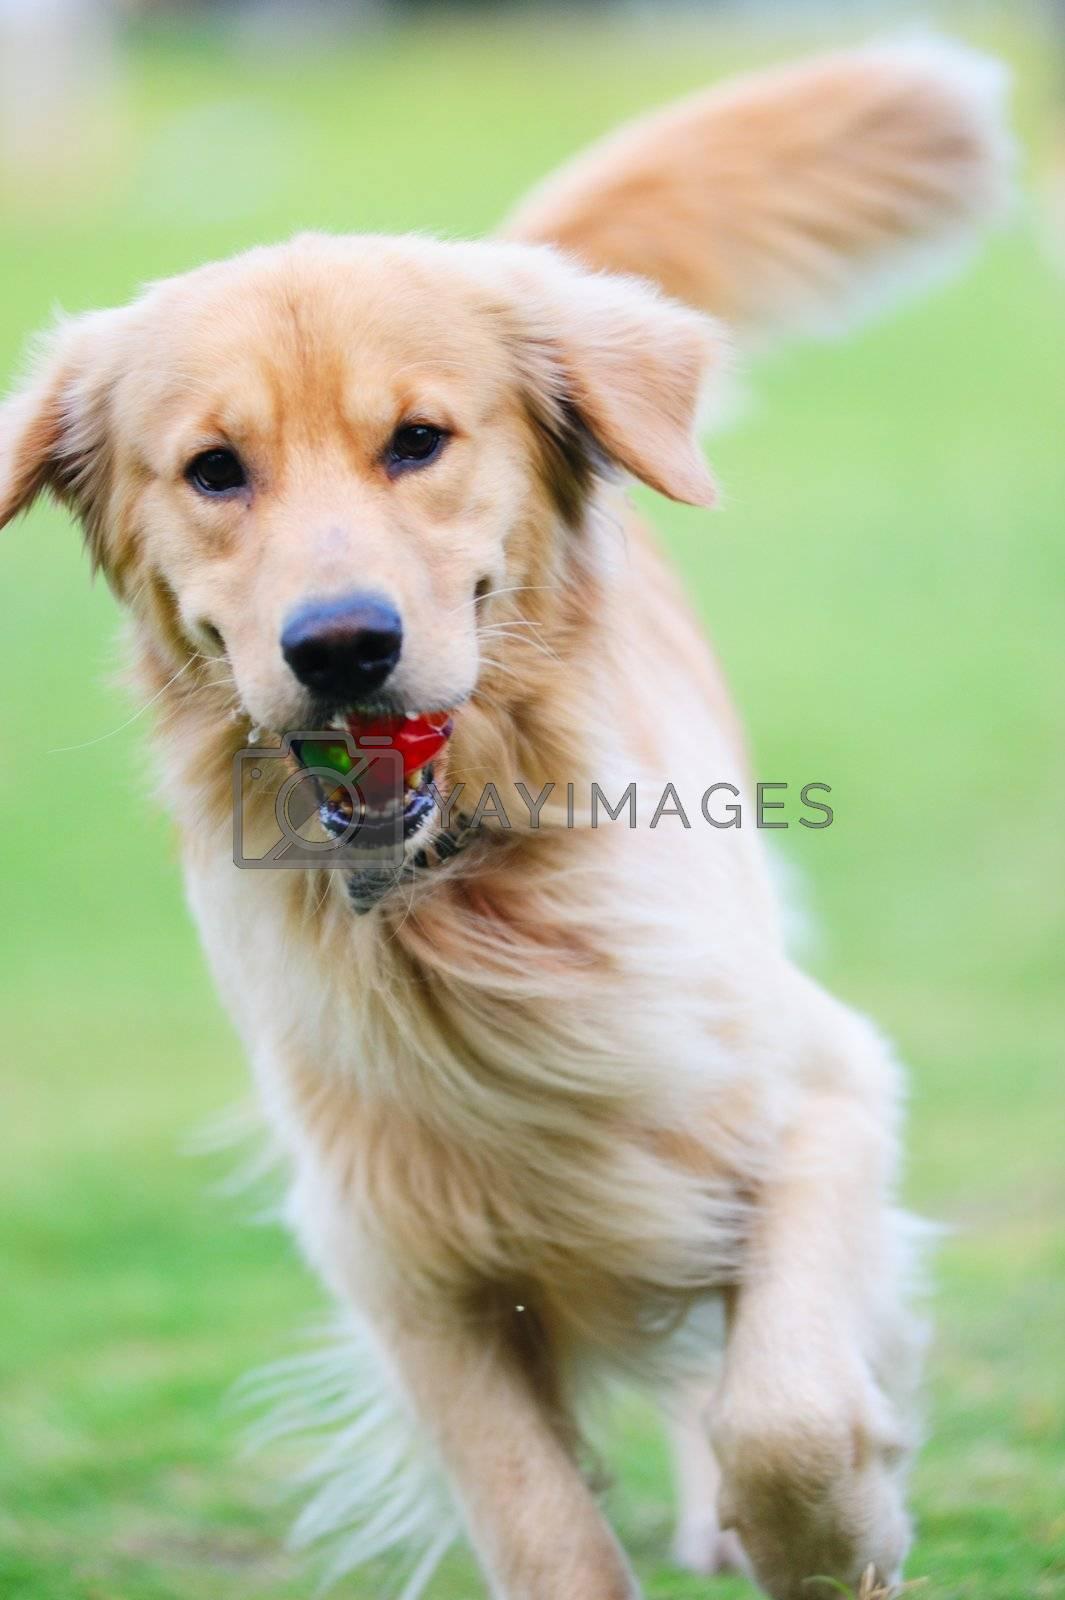 Golden retriever dog running on the lawn